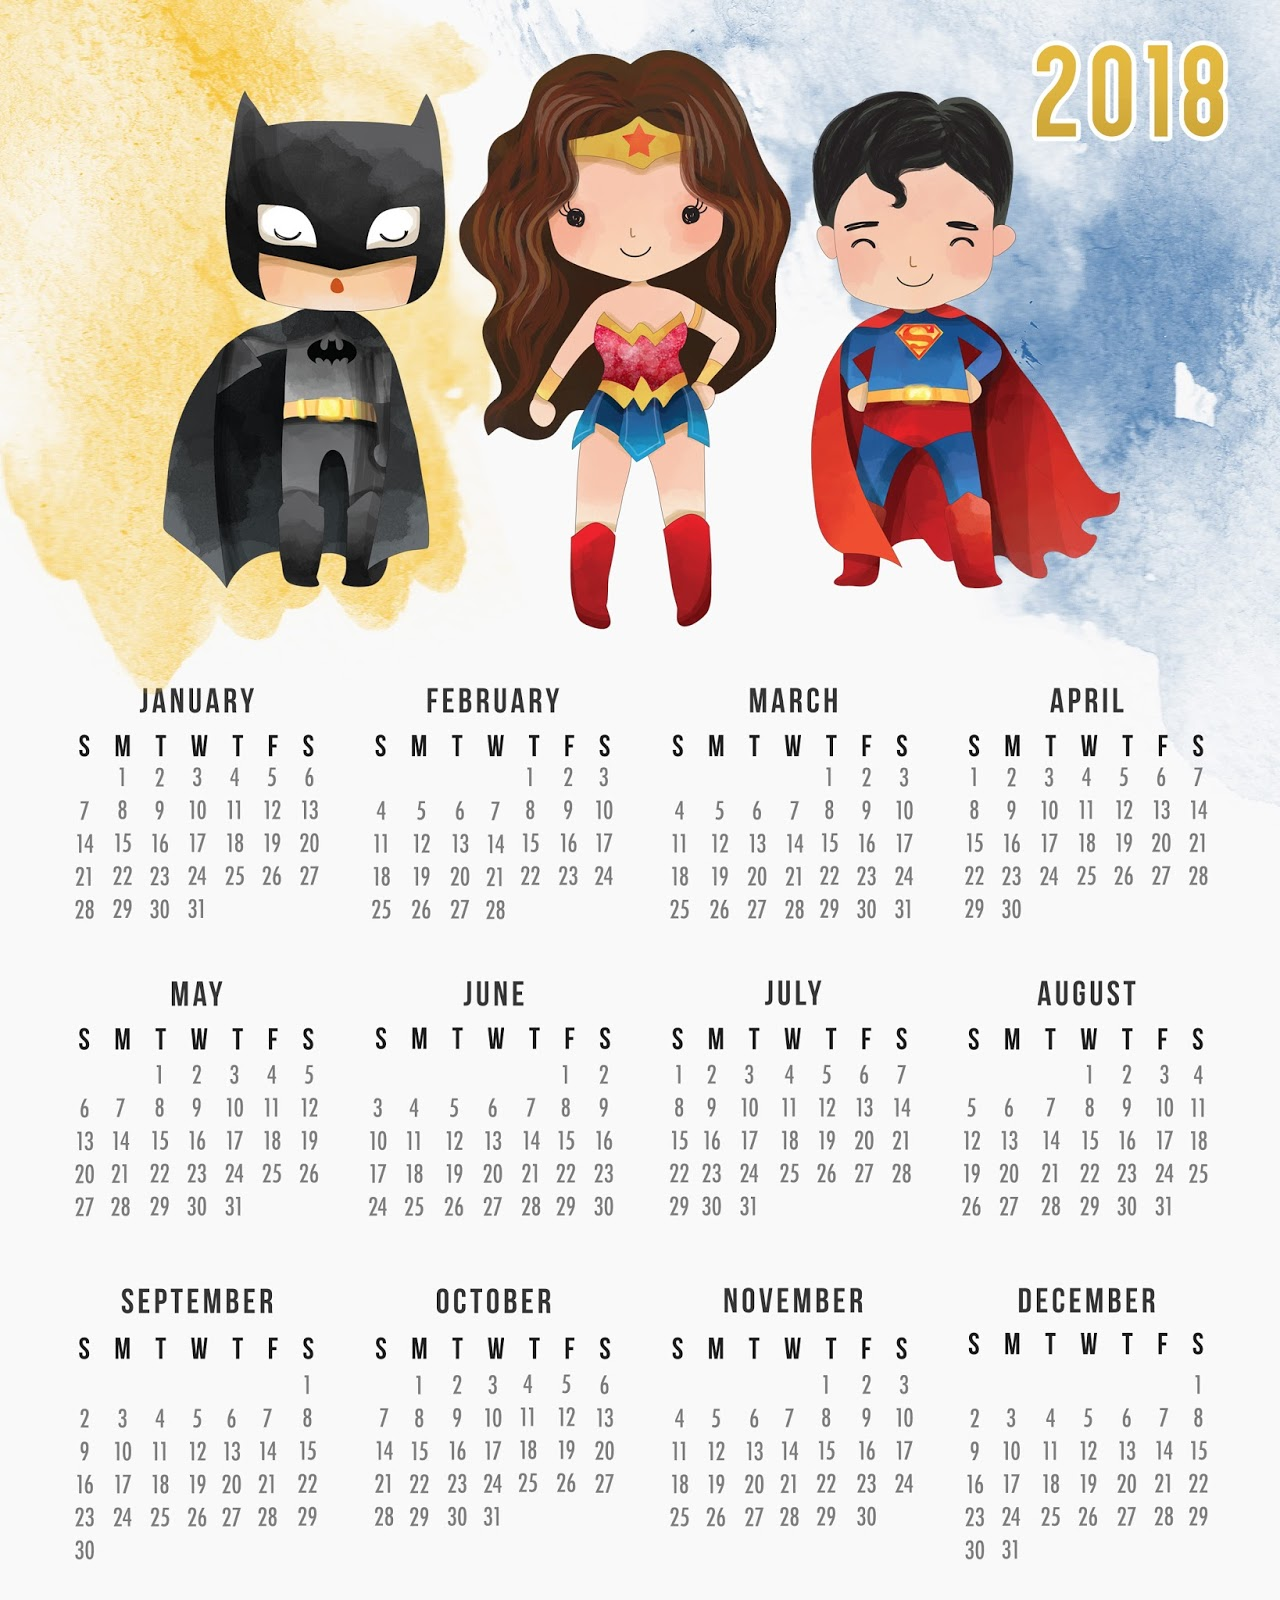 Free Printable 2018 Justice League Calendar.   Oh My Fiesta! for Geeks